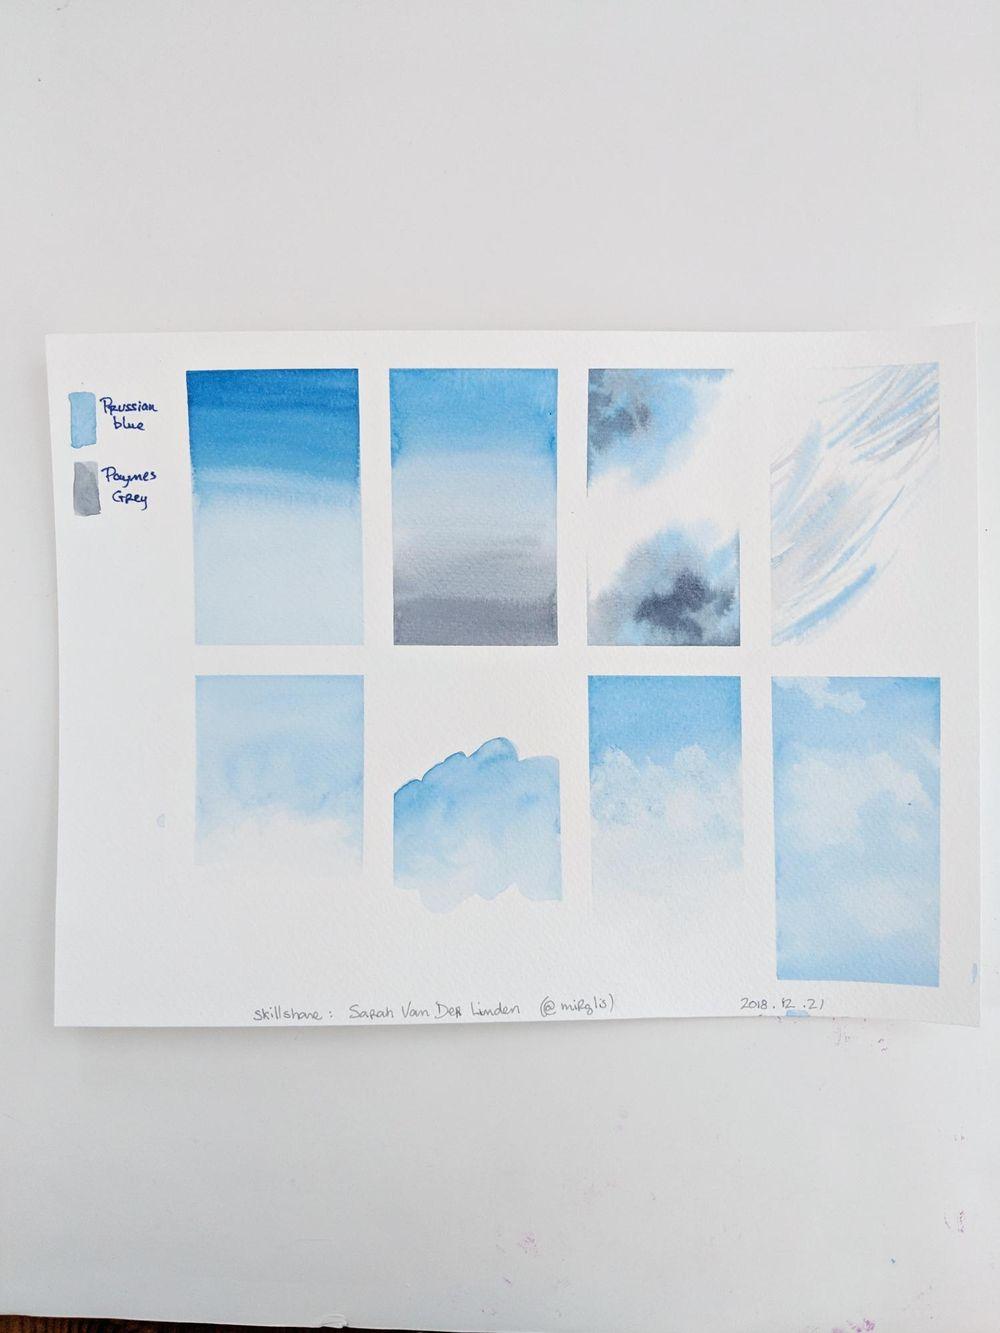 Ciels avec Sarah - image 2 - student project